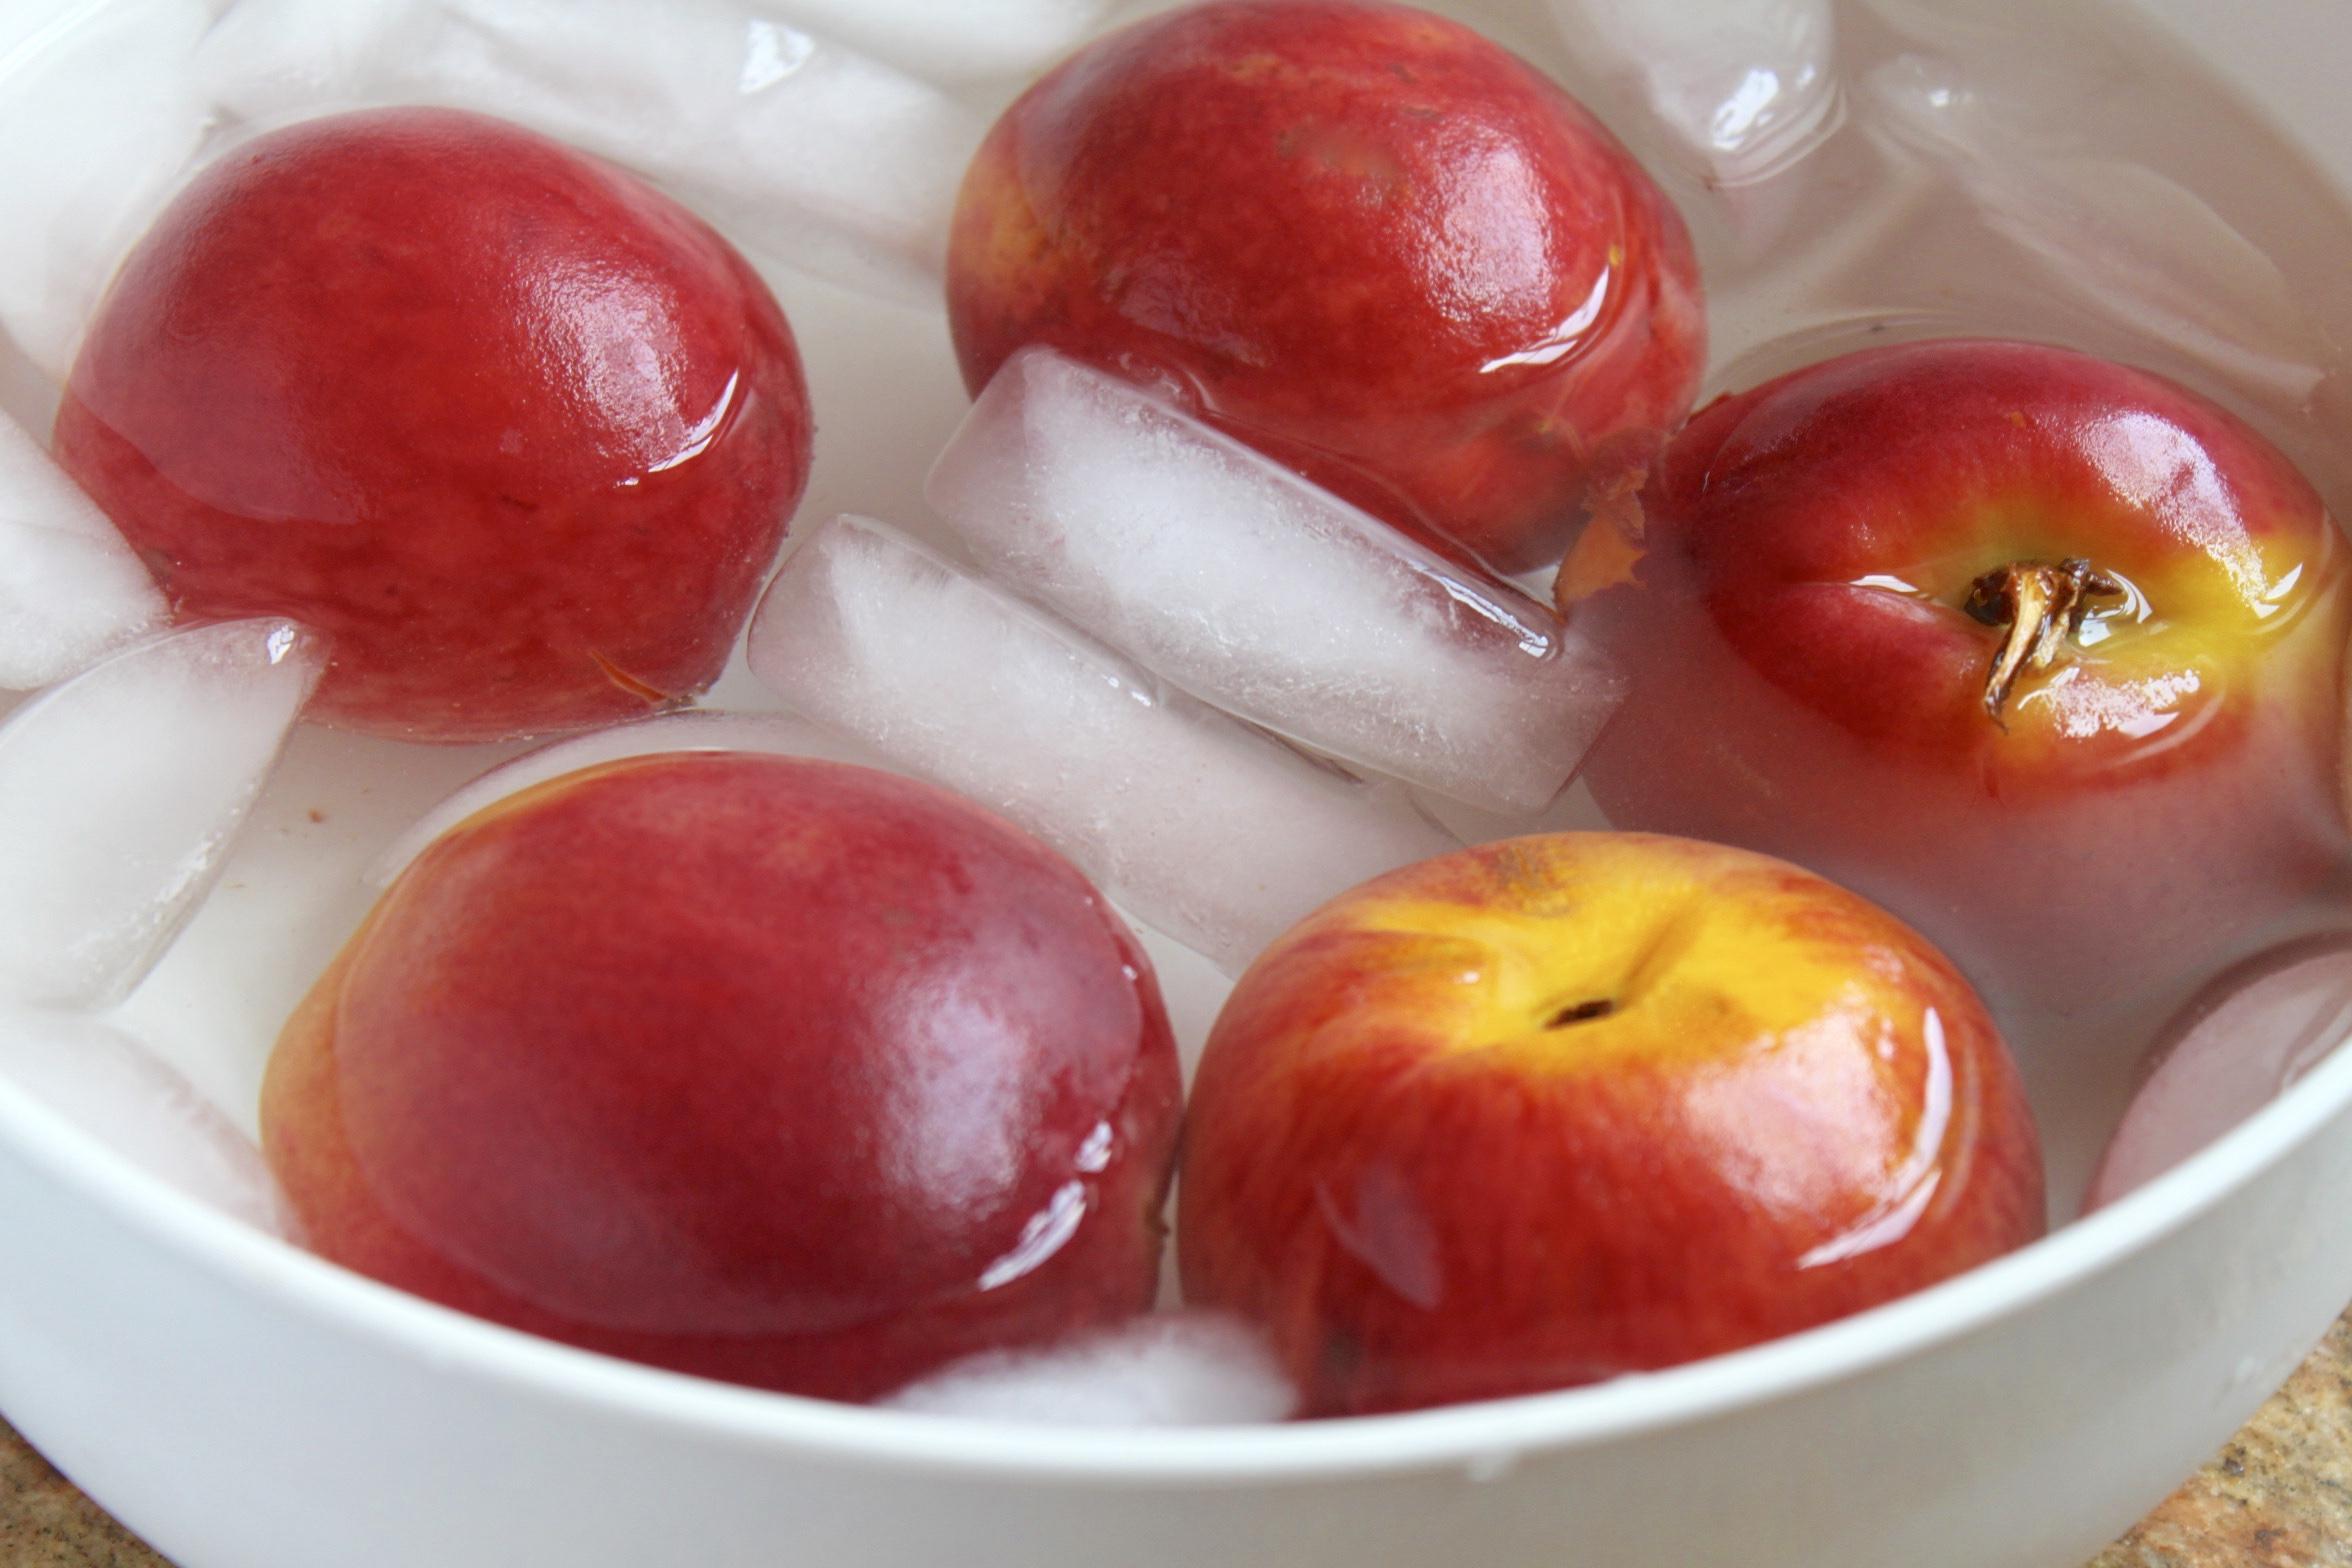 peaches in ice bath